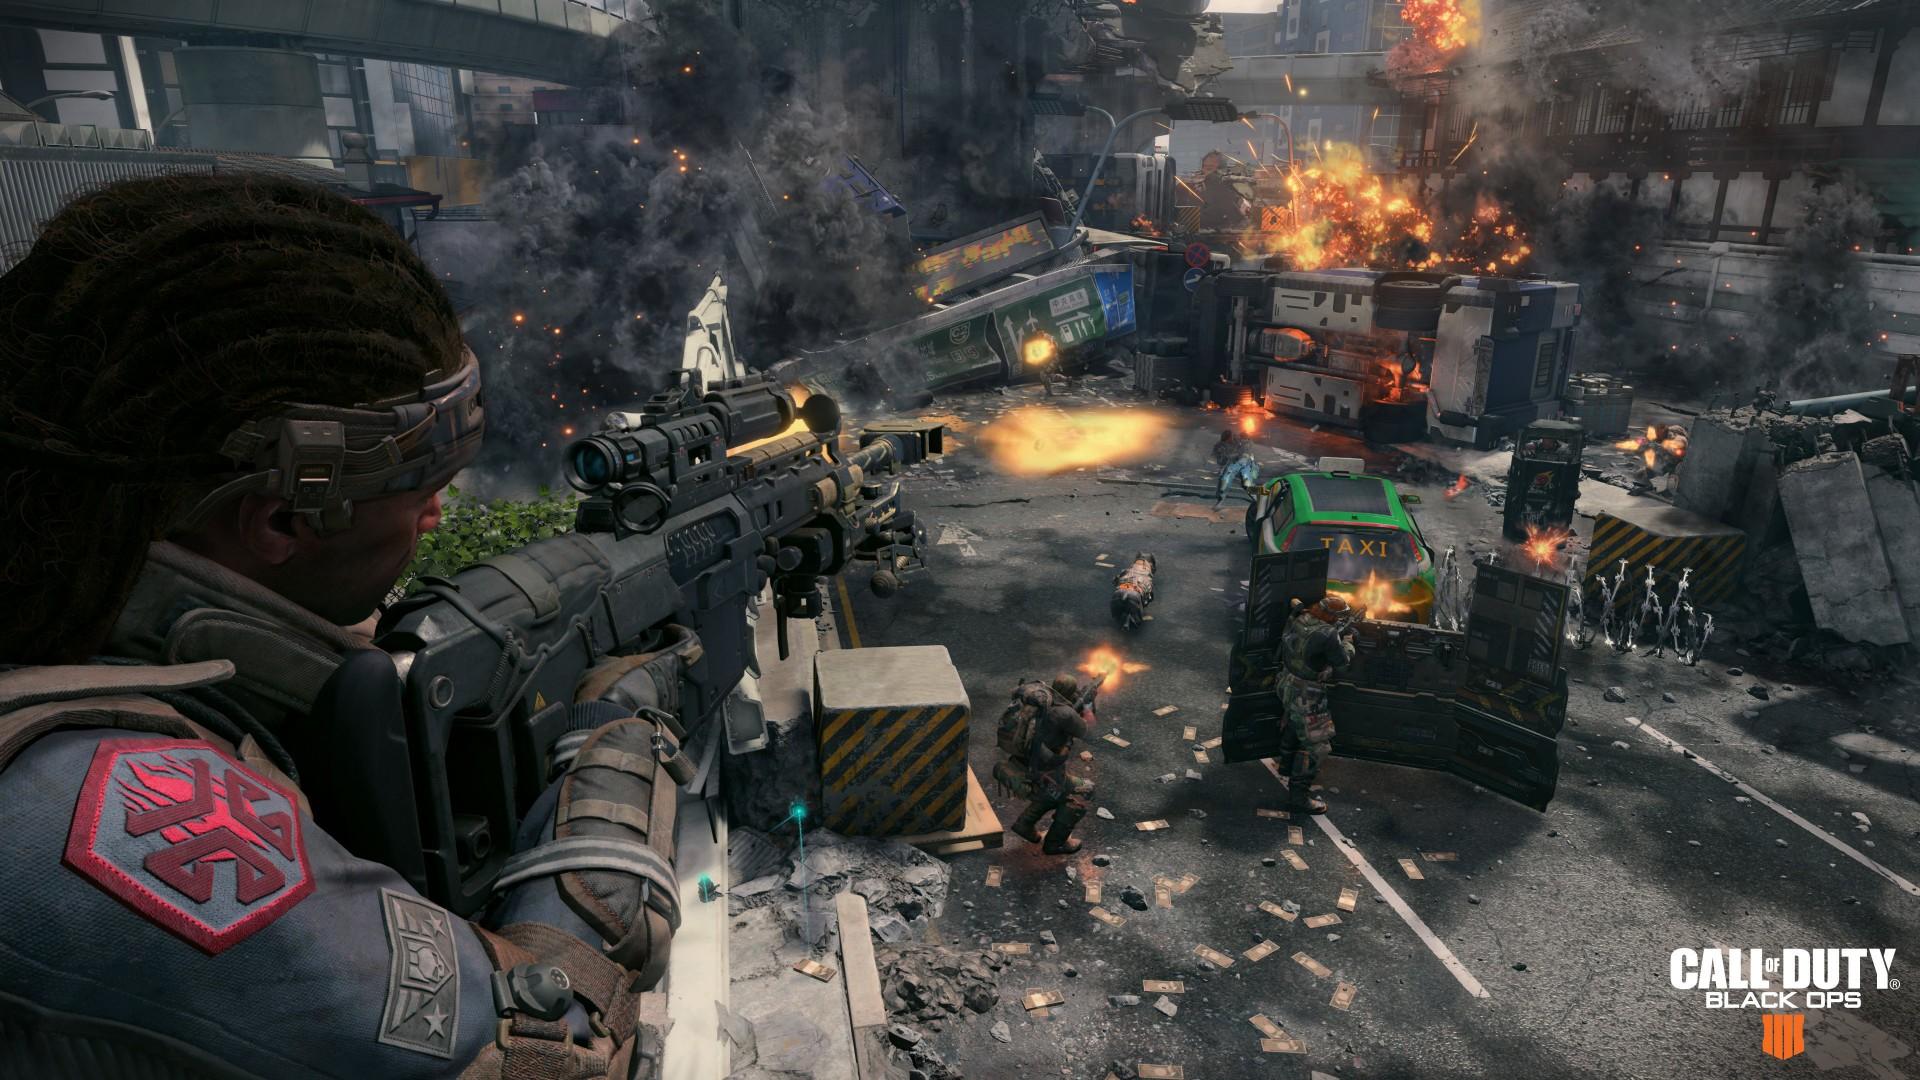 Wallpaper Call Of Duty Black Ops 4, Screenshot, 4K, Games -3917